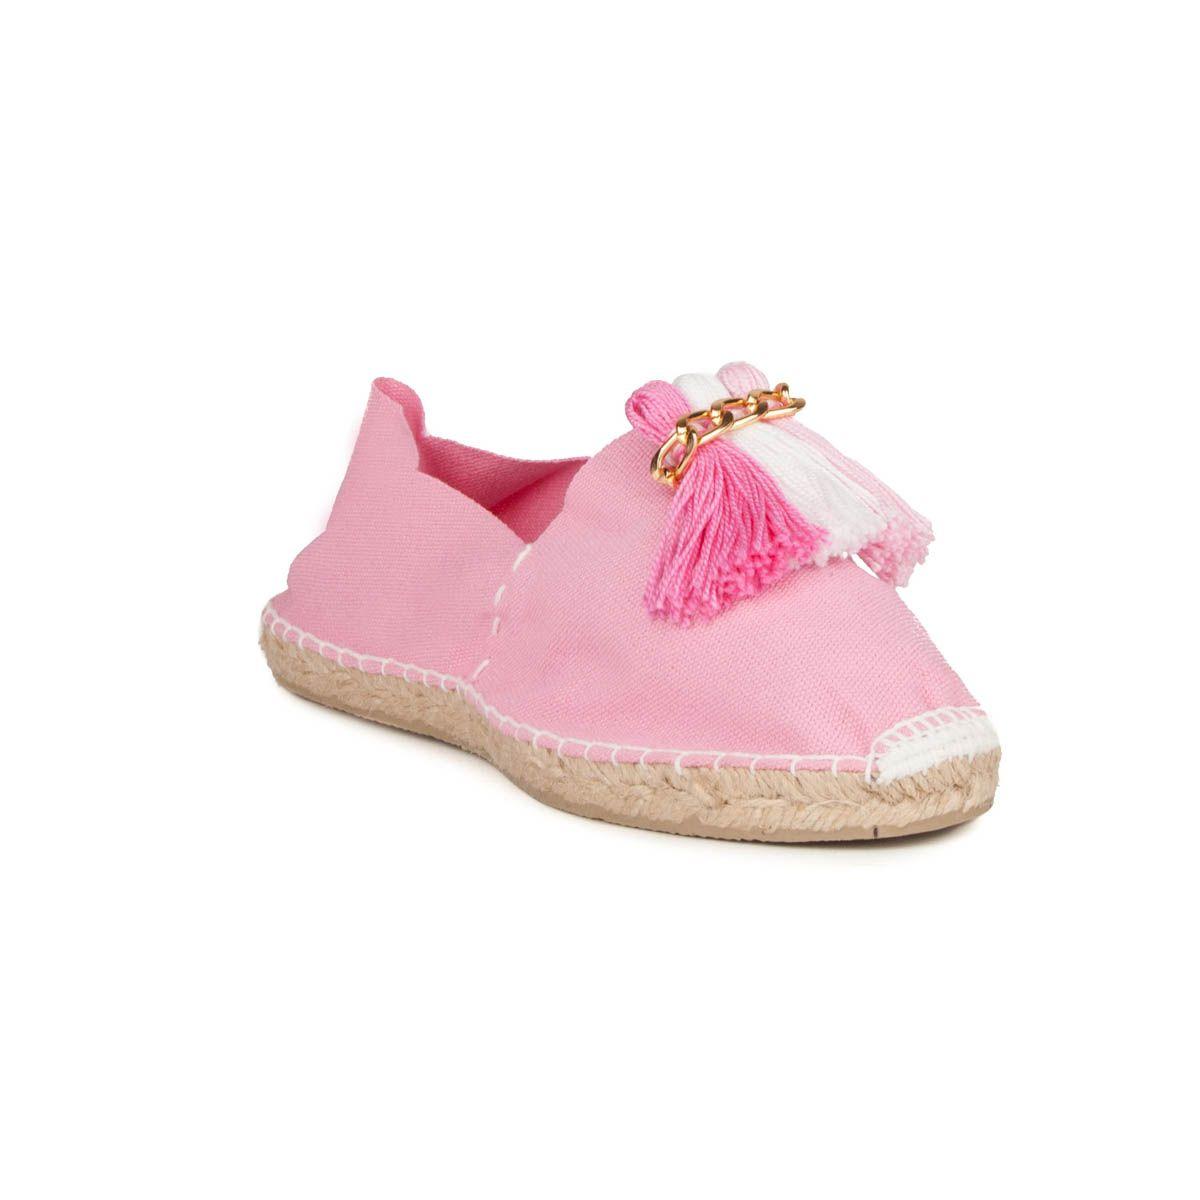 Maria Graor Tassel Espadrille in Pink